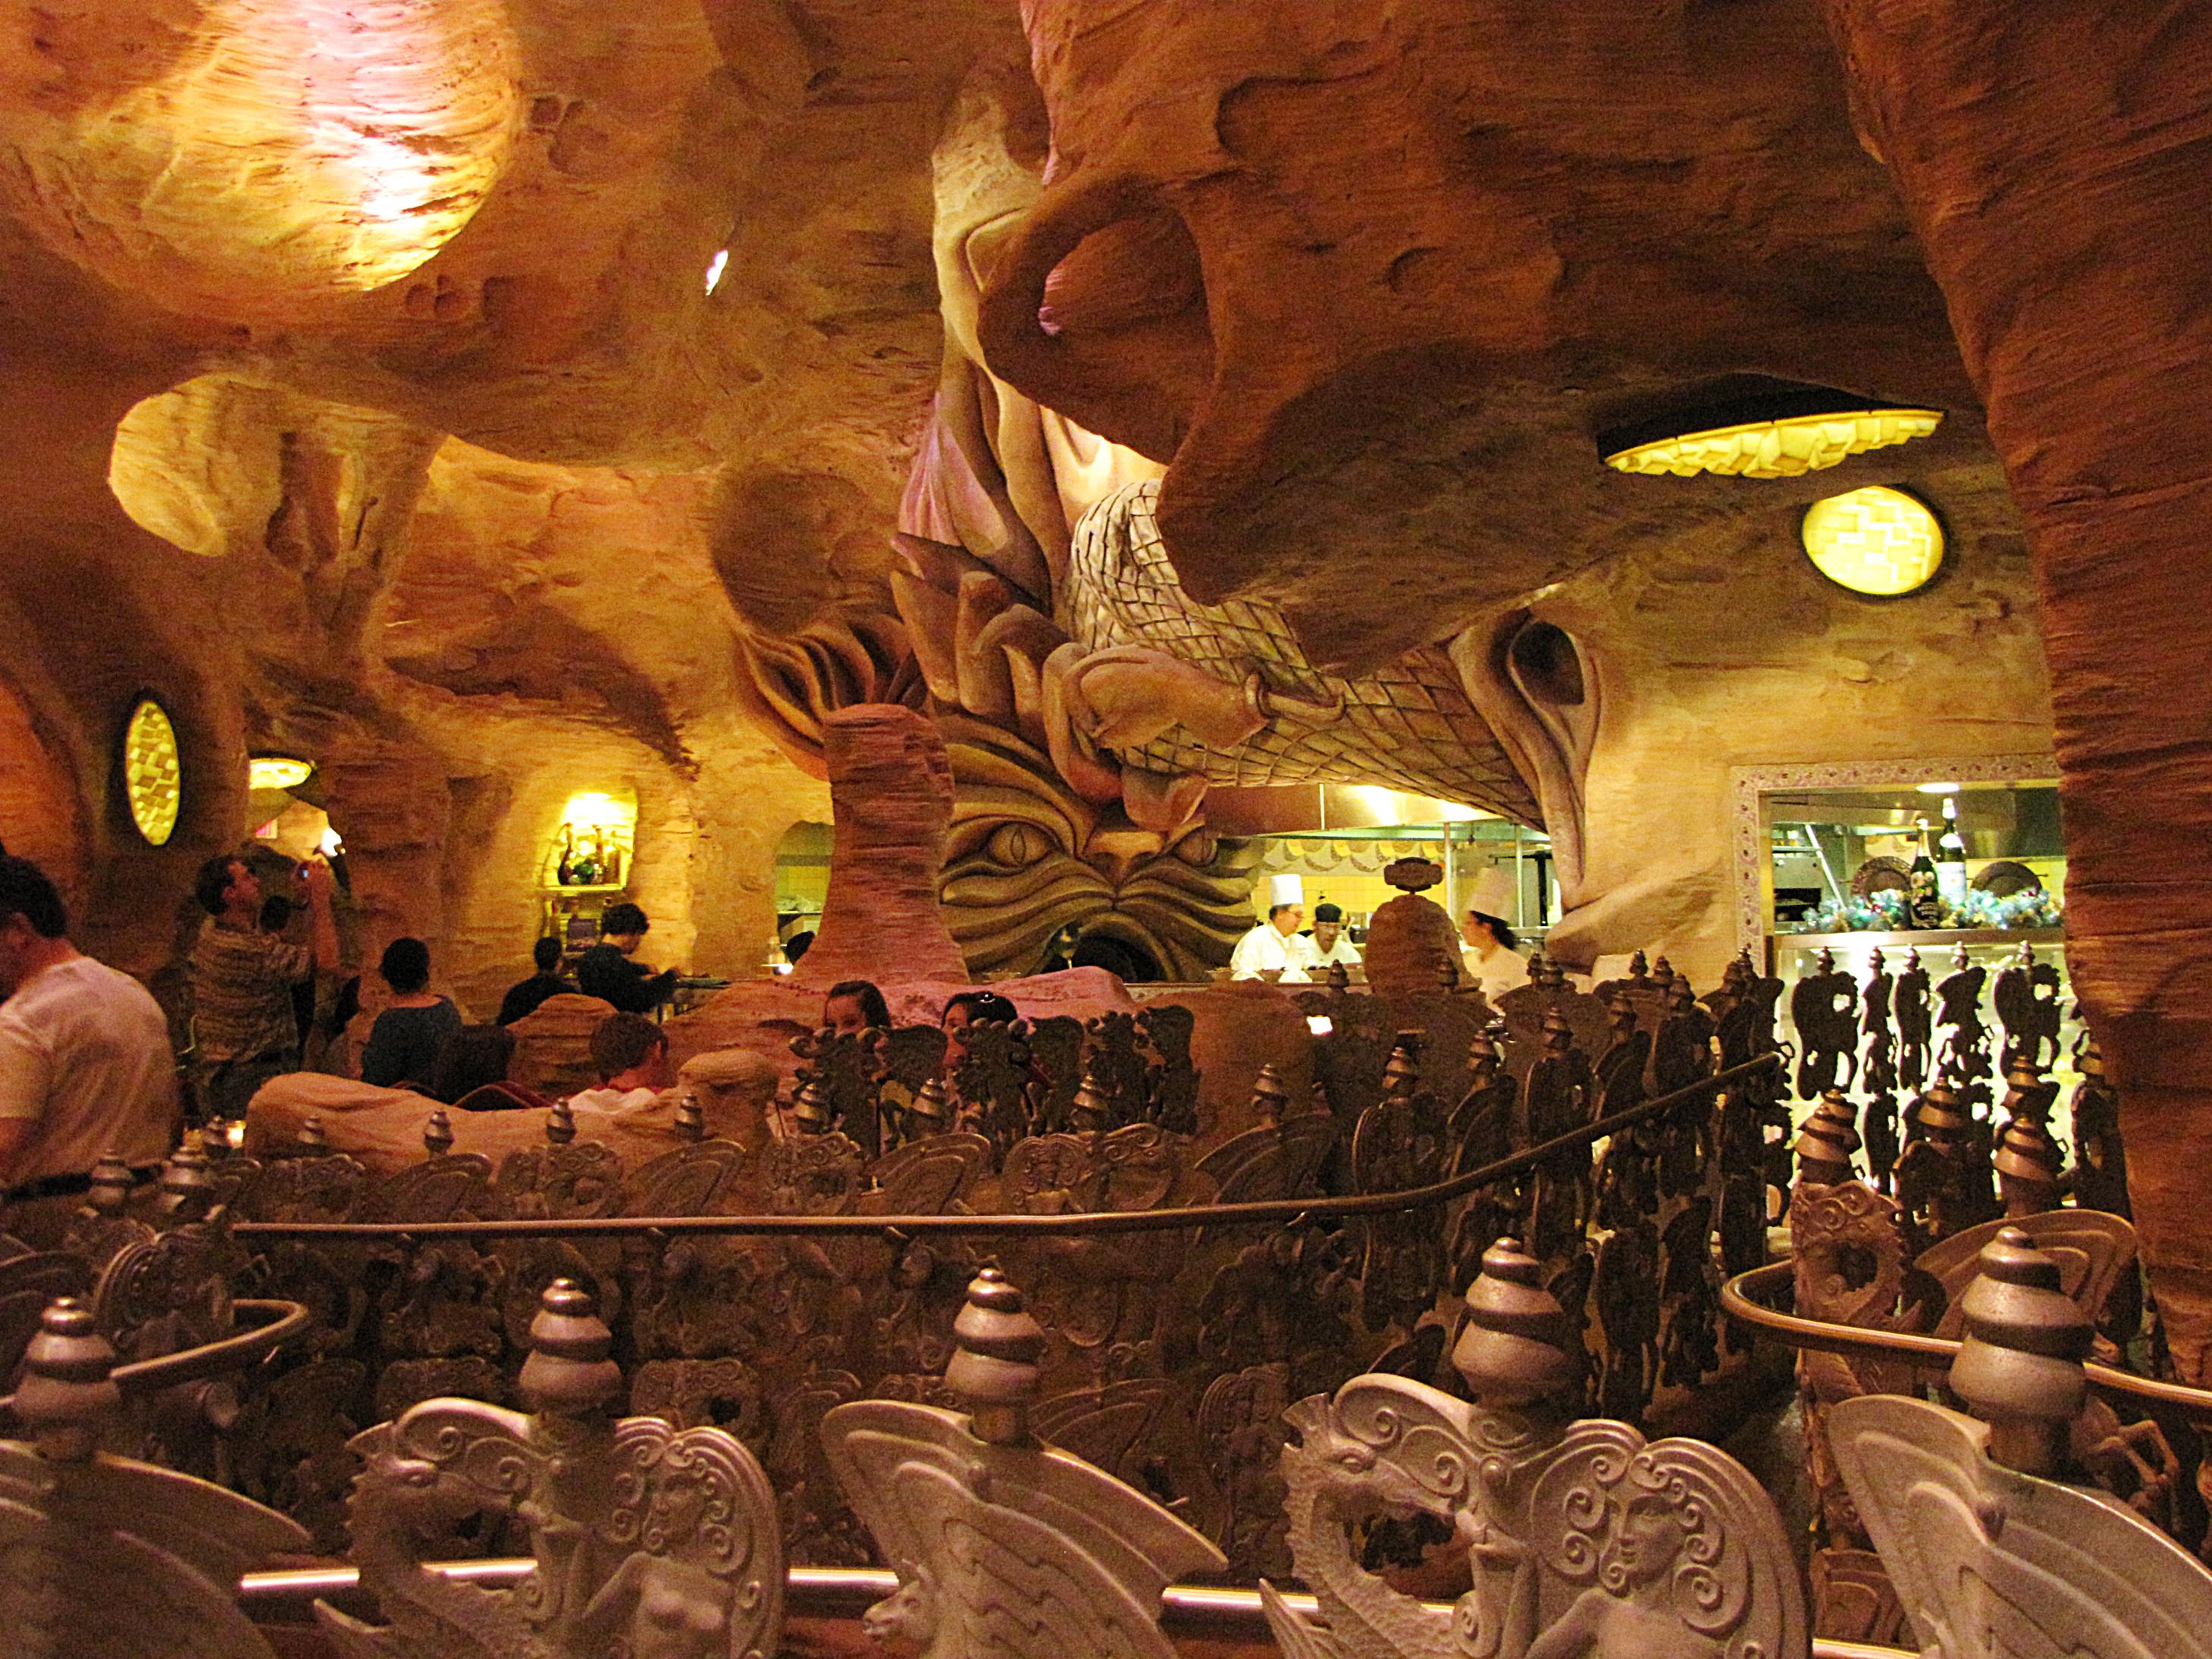 Fine dining restaurants, Orlando vacation and Island of adventure ...